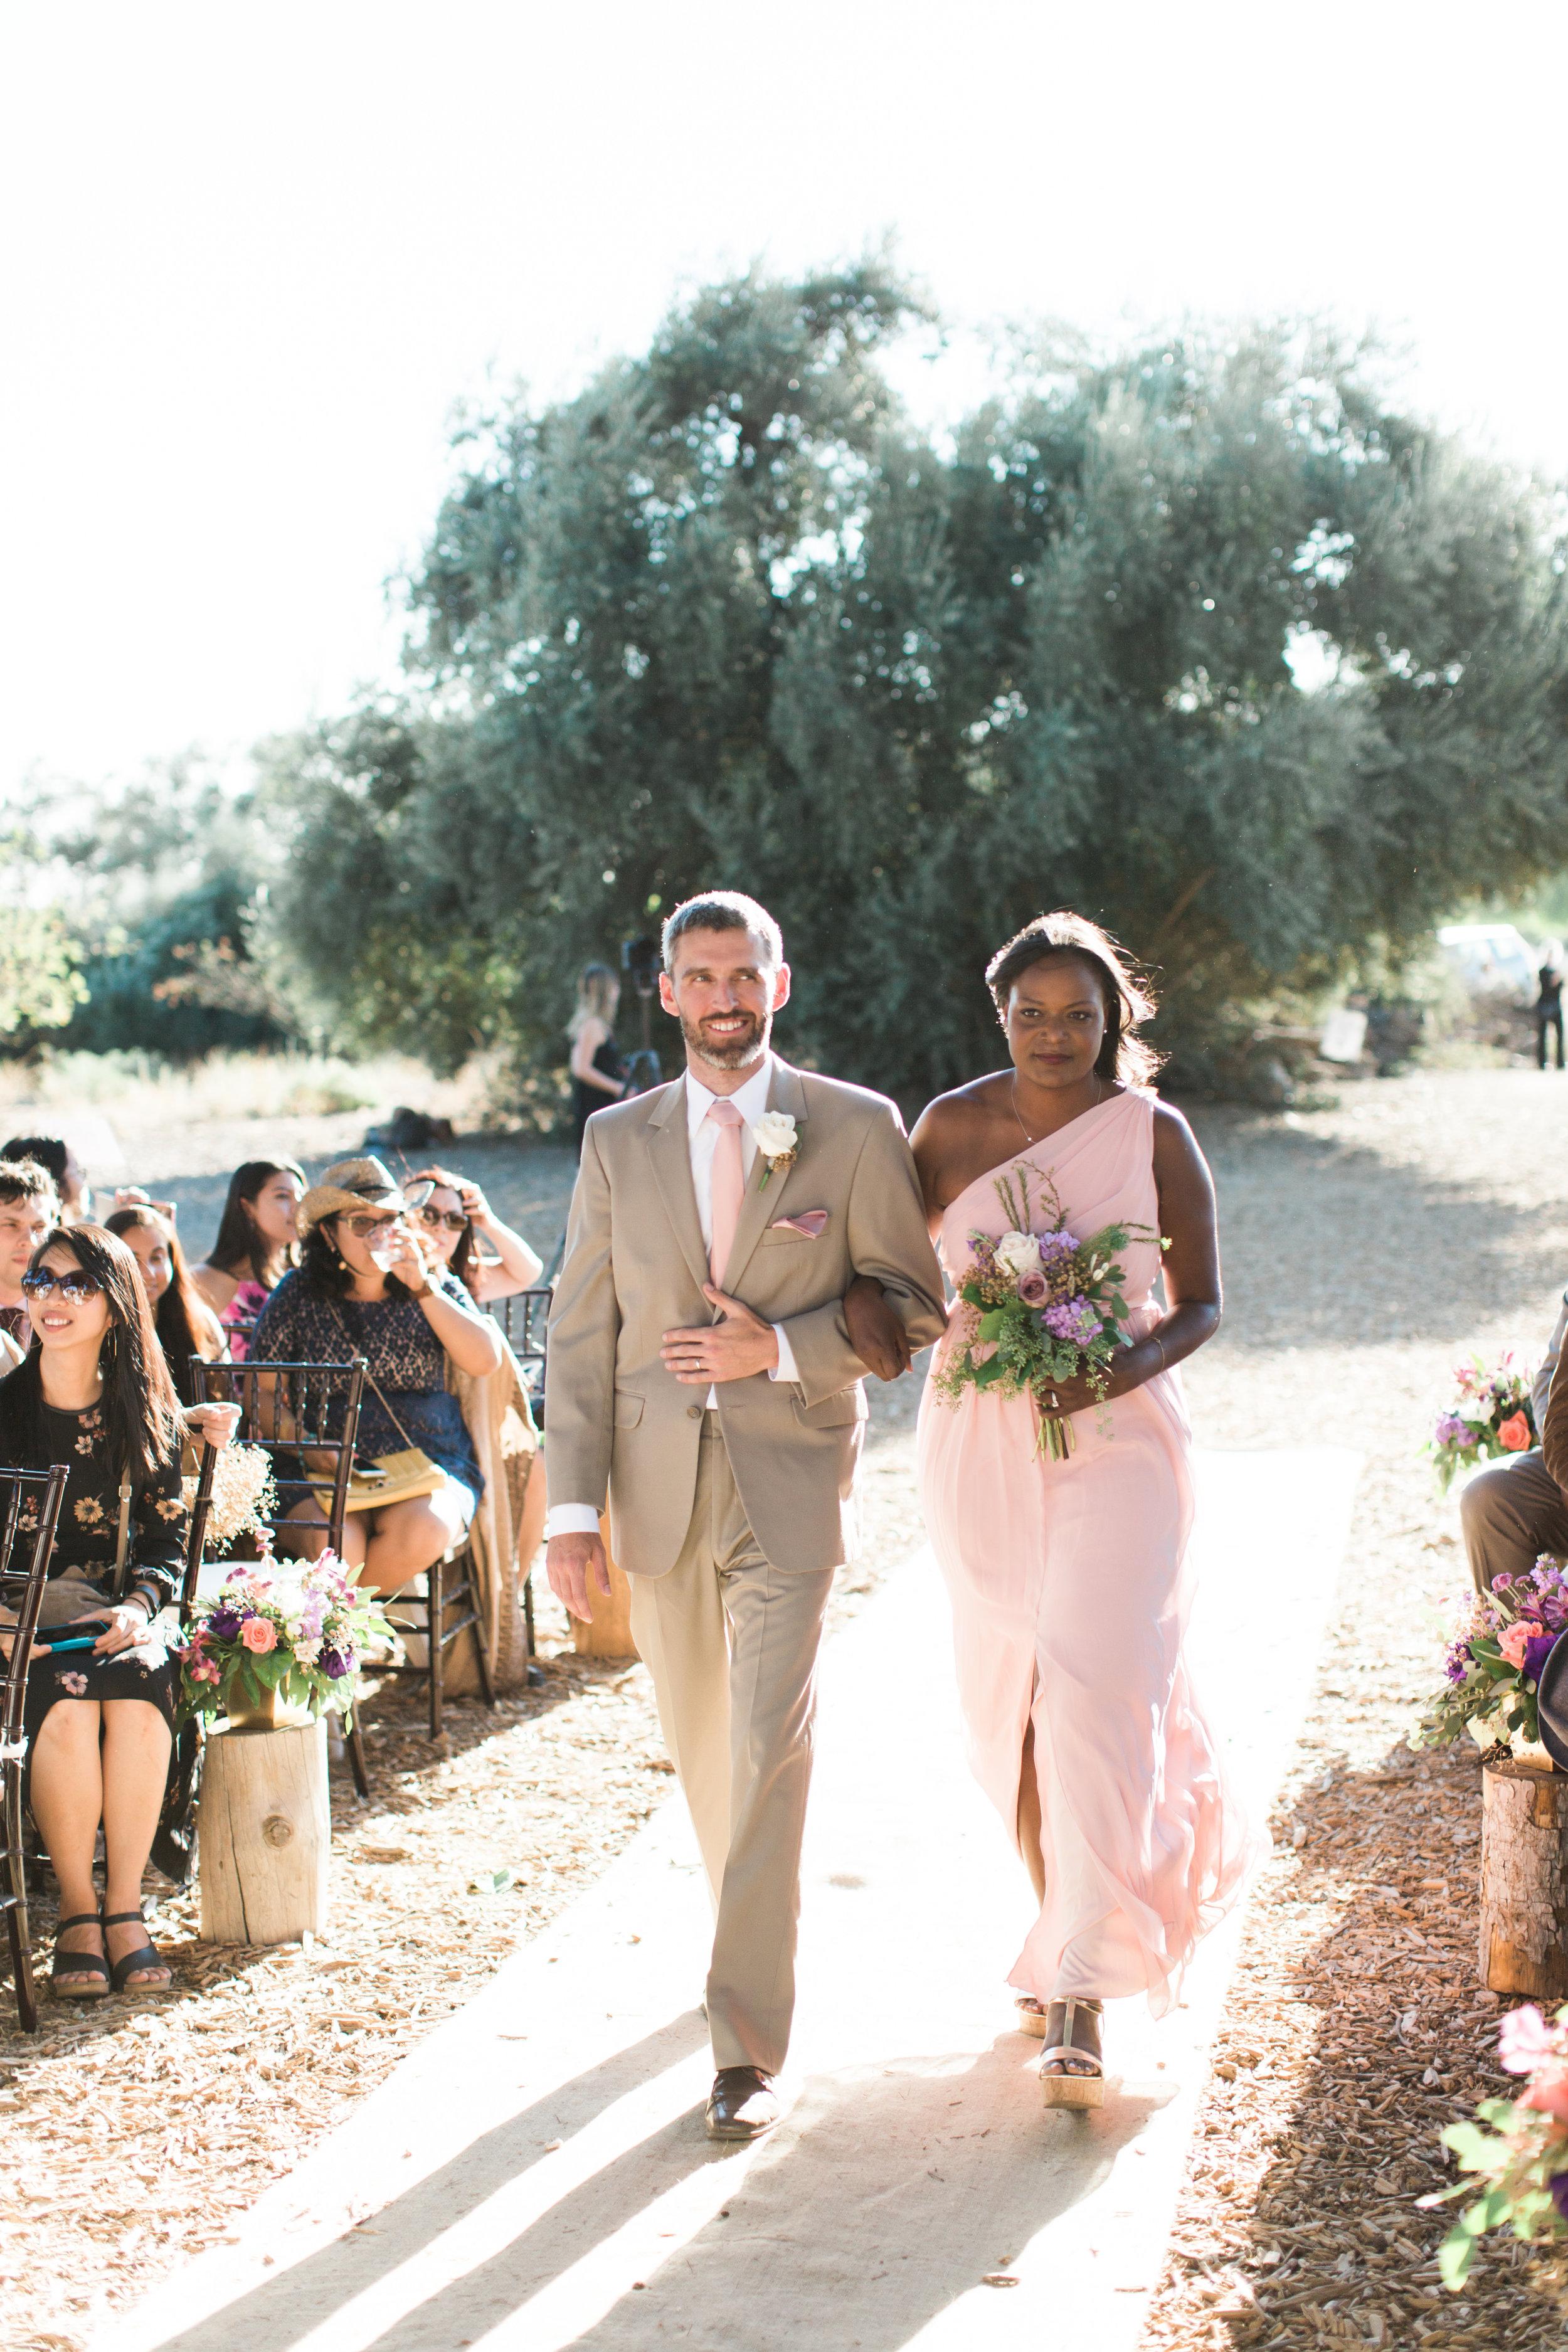 Jenny Quicksall Photography_www.jennyquicksall.com_California Wedding Photographer_Highland Springs Ranch and Inn Resort_Cherry Valley California (36).JPG